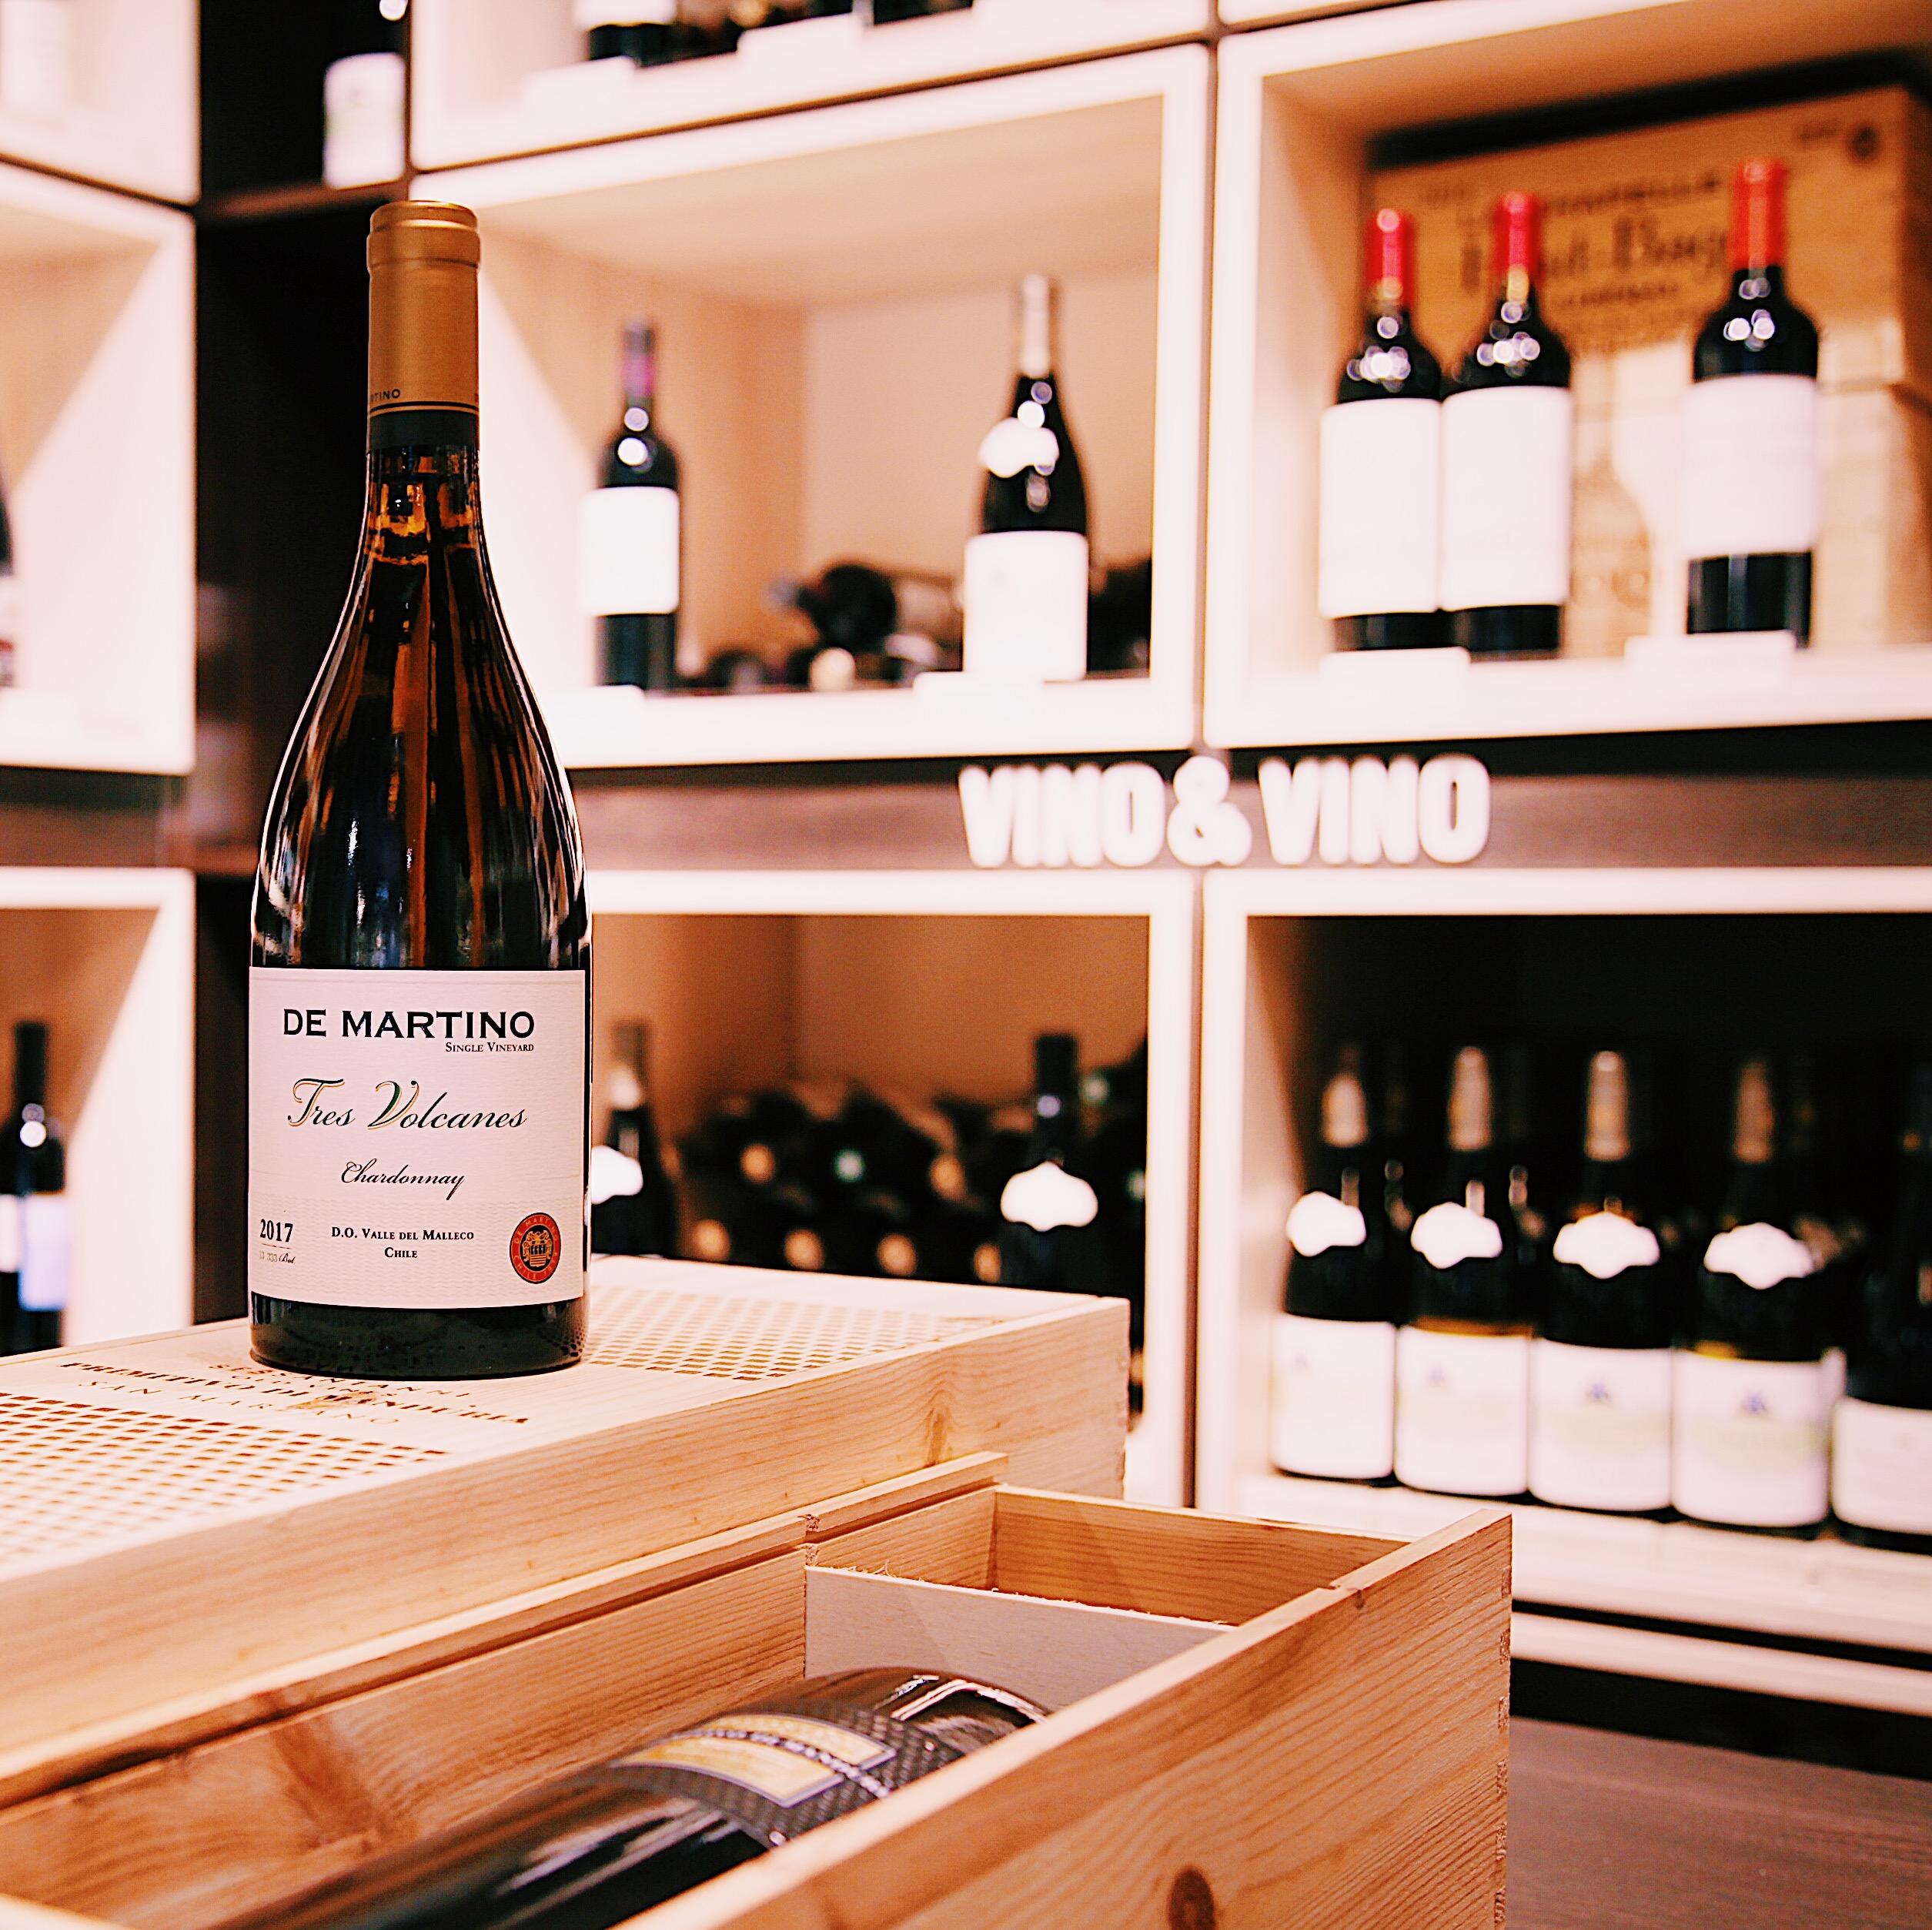 De Martino Chardonnay Reserva